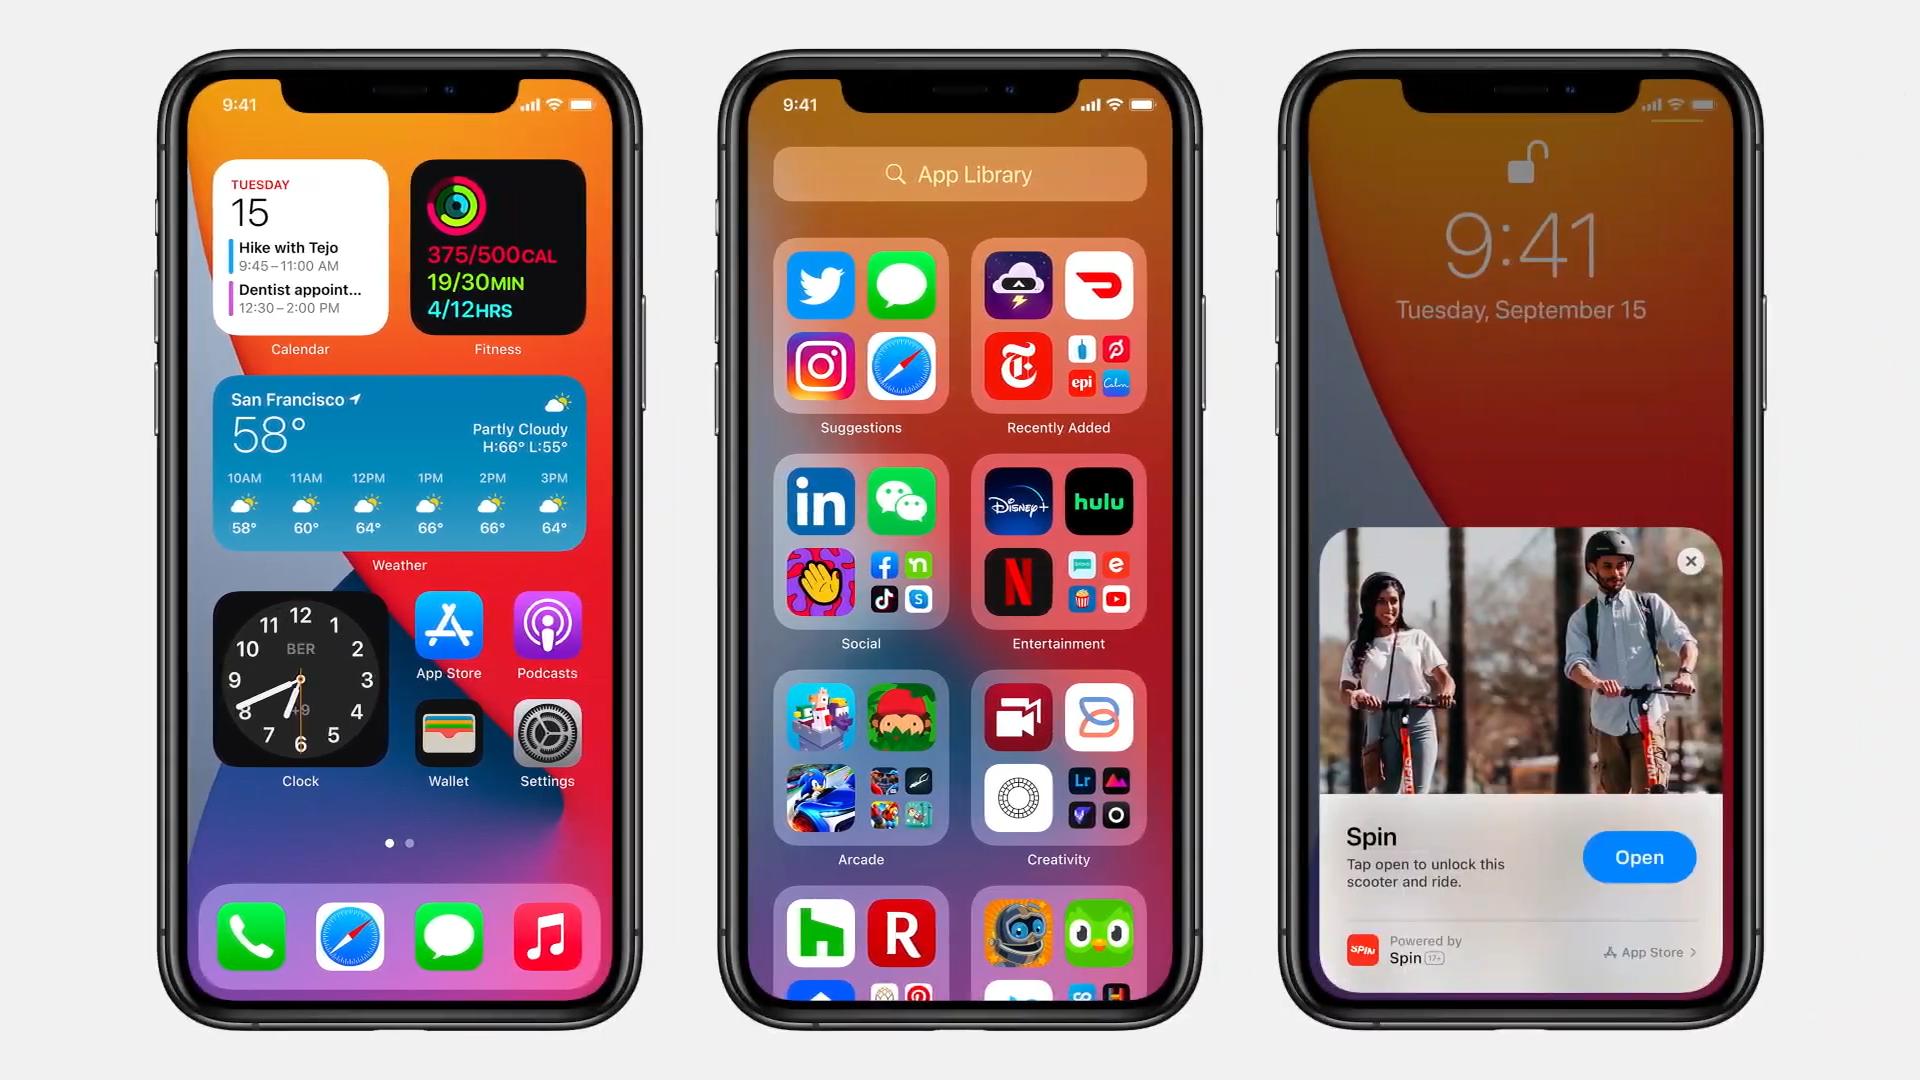 Apple's OS updates